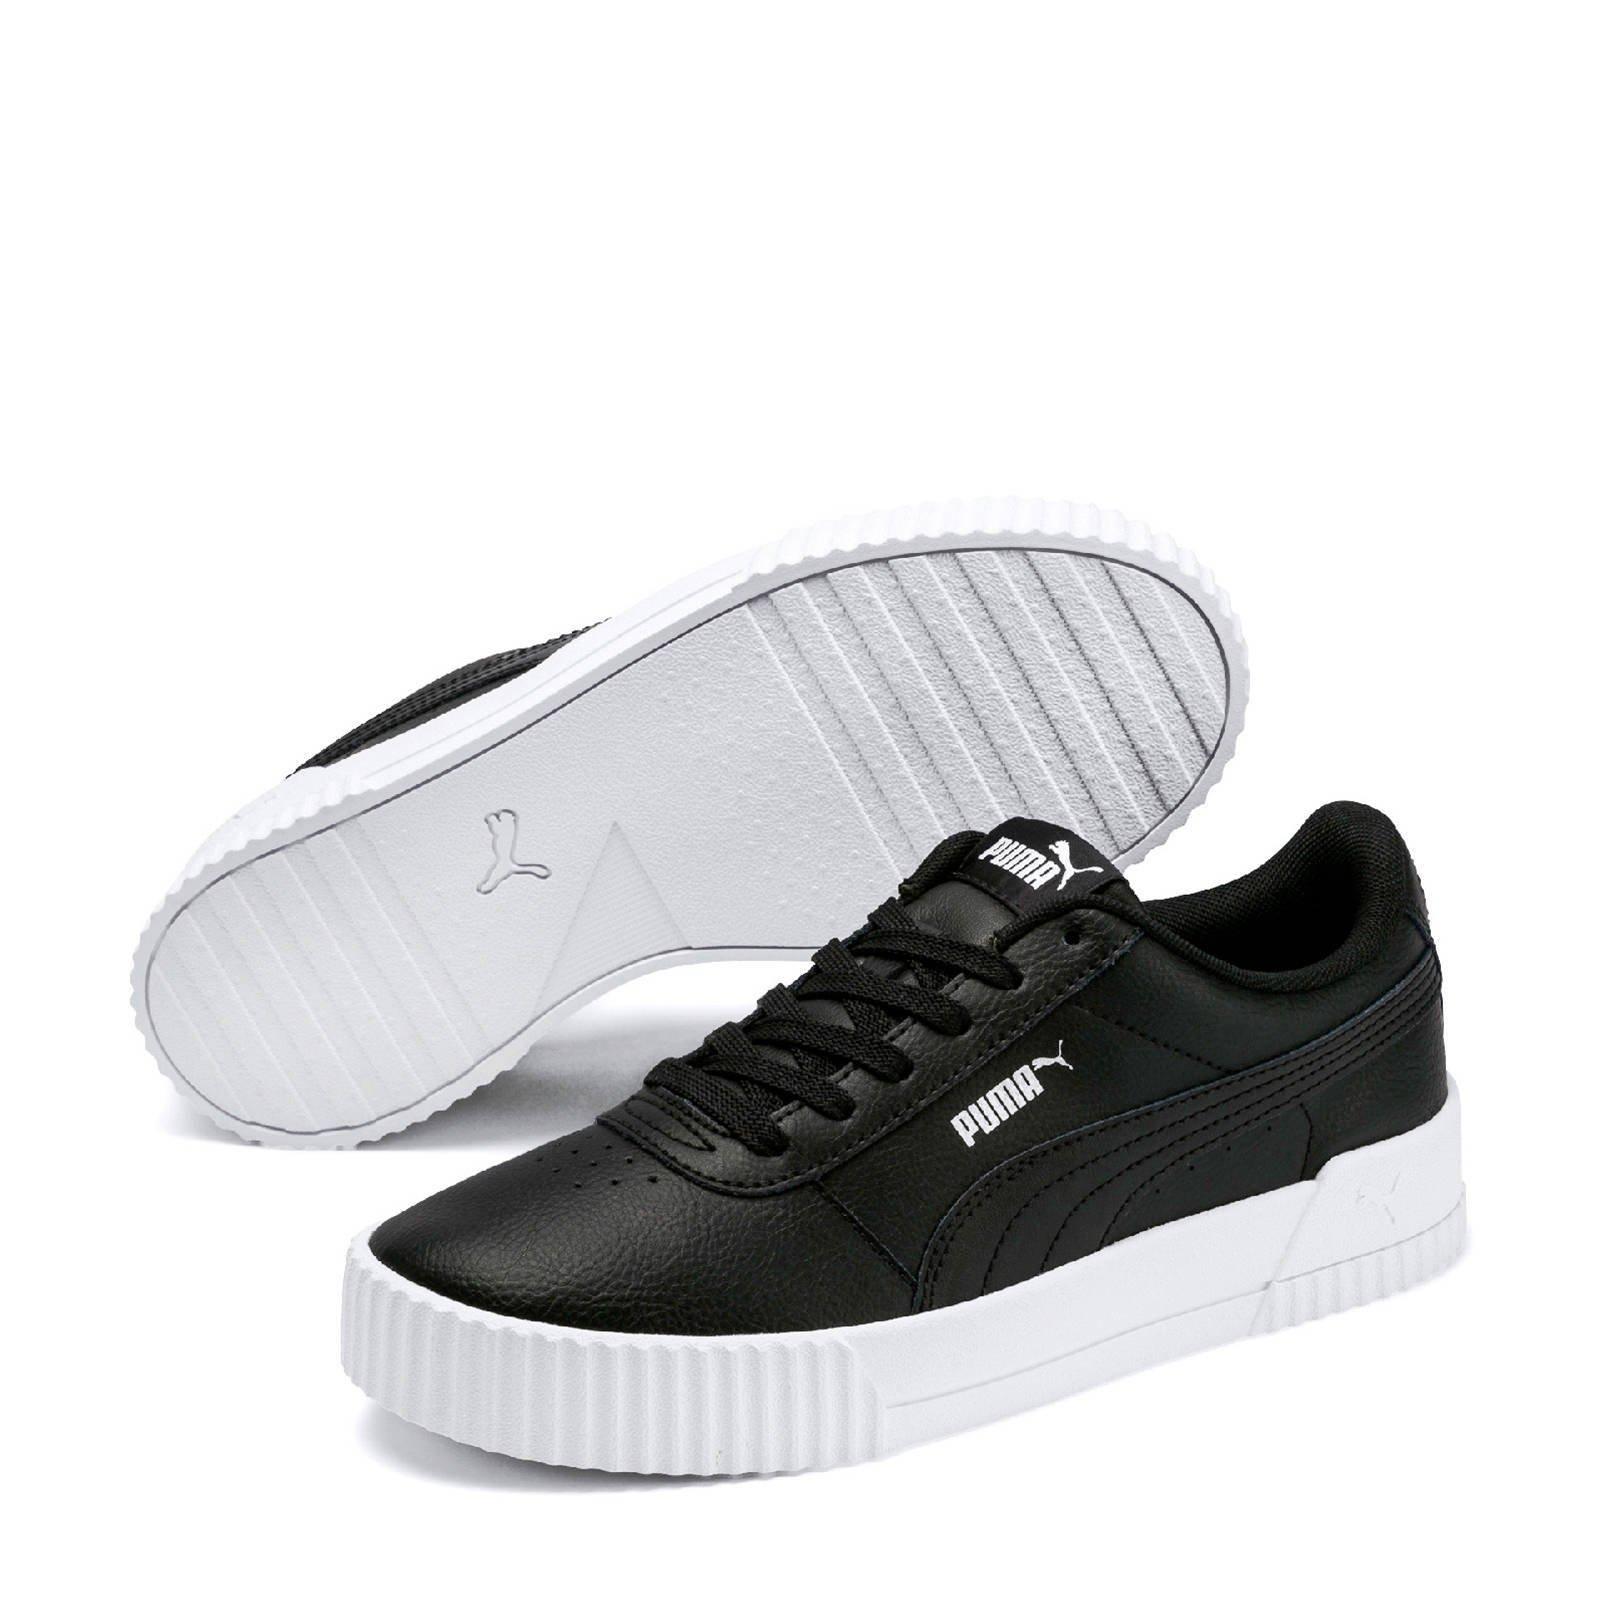 Carina L sneakers zwart/wit